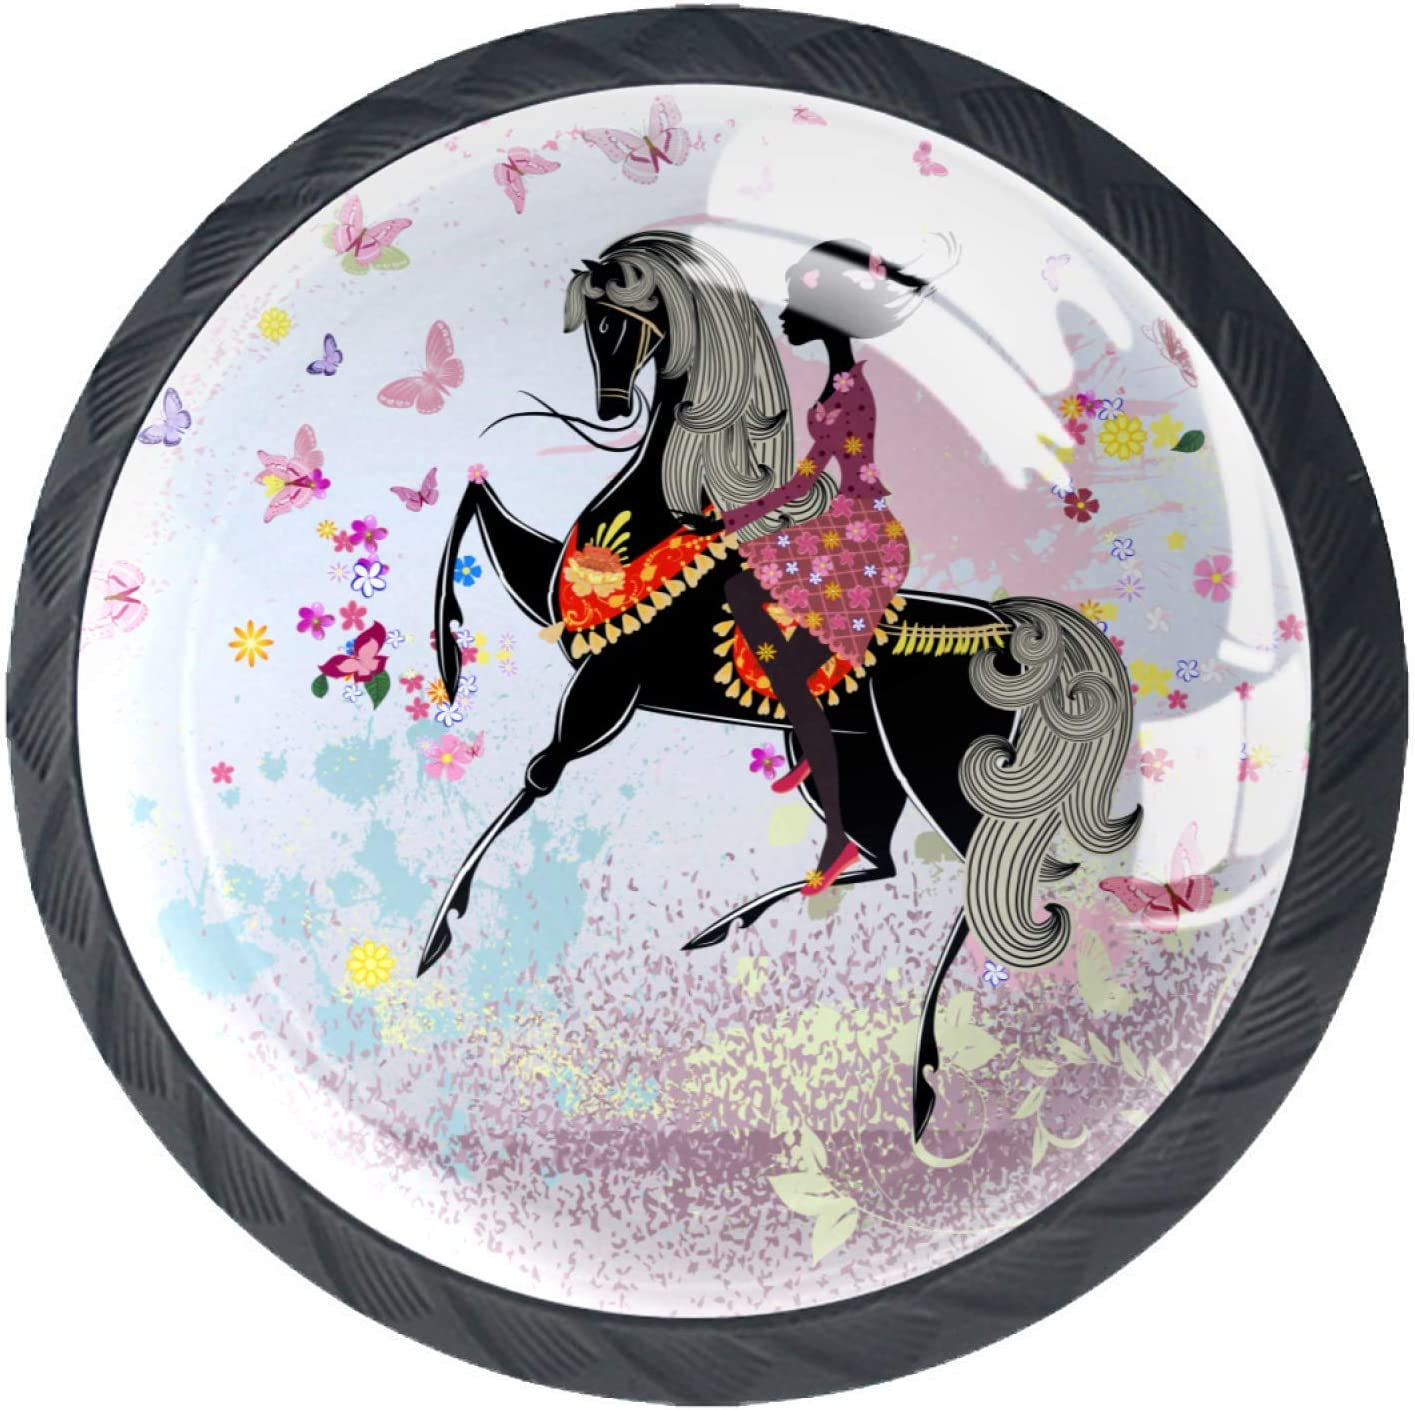 4 Pcs Round Furniture Knob,Drawer Dresser Cupboard Wardrobe Pulls Handles for Home Kitchen,Pink Fairy Butterfly Girl Floral Horse